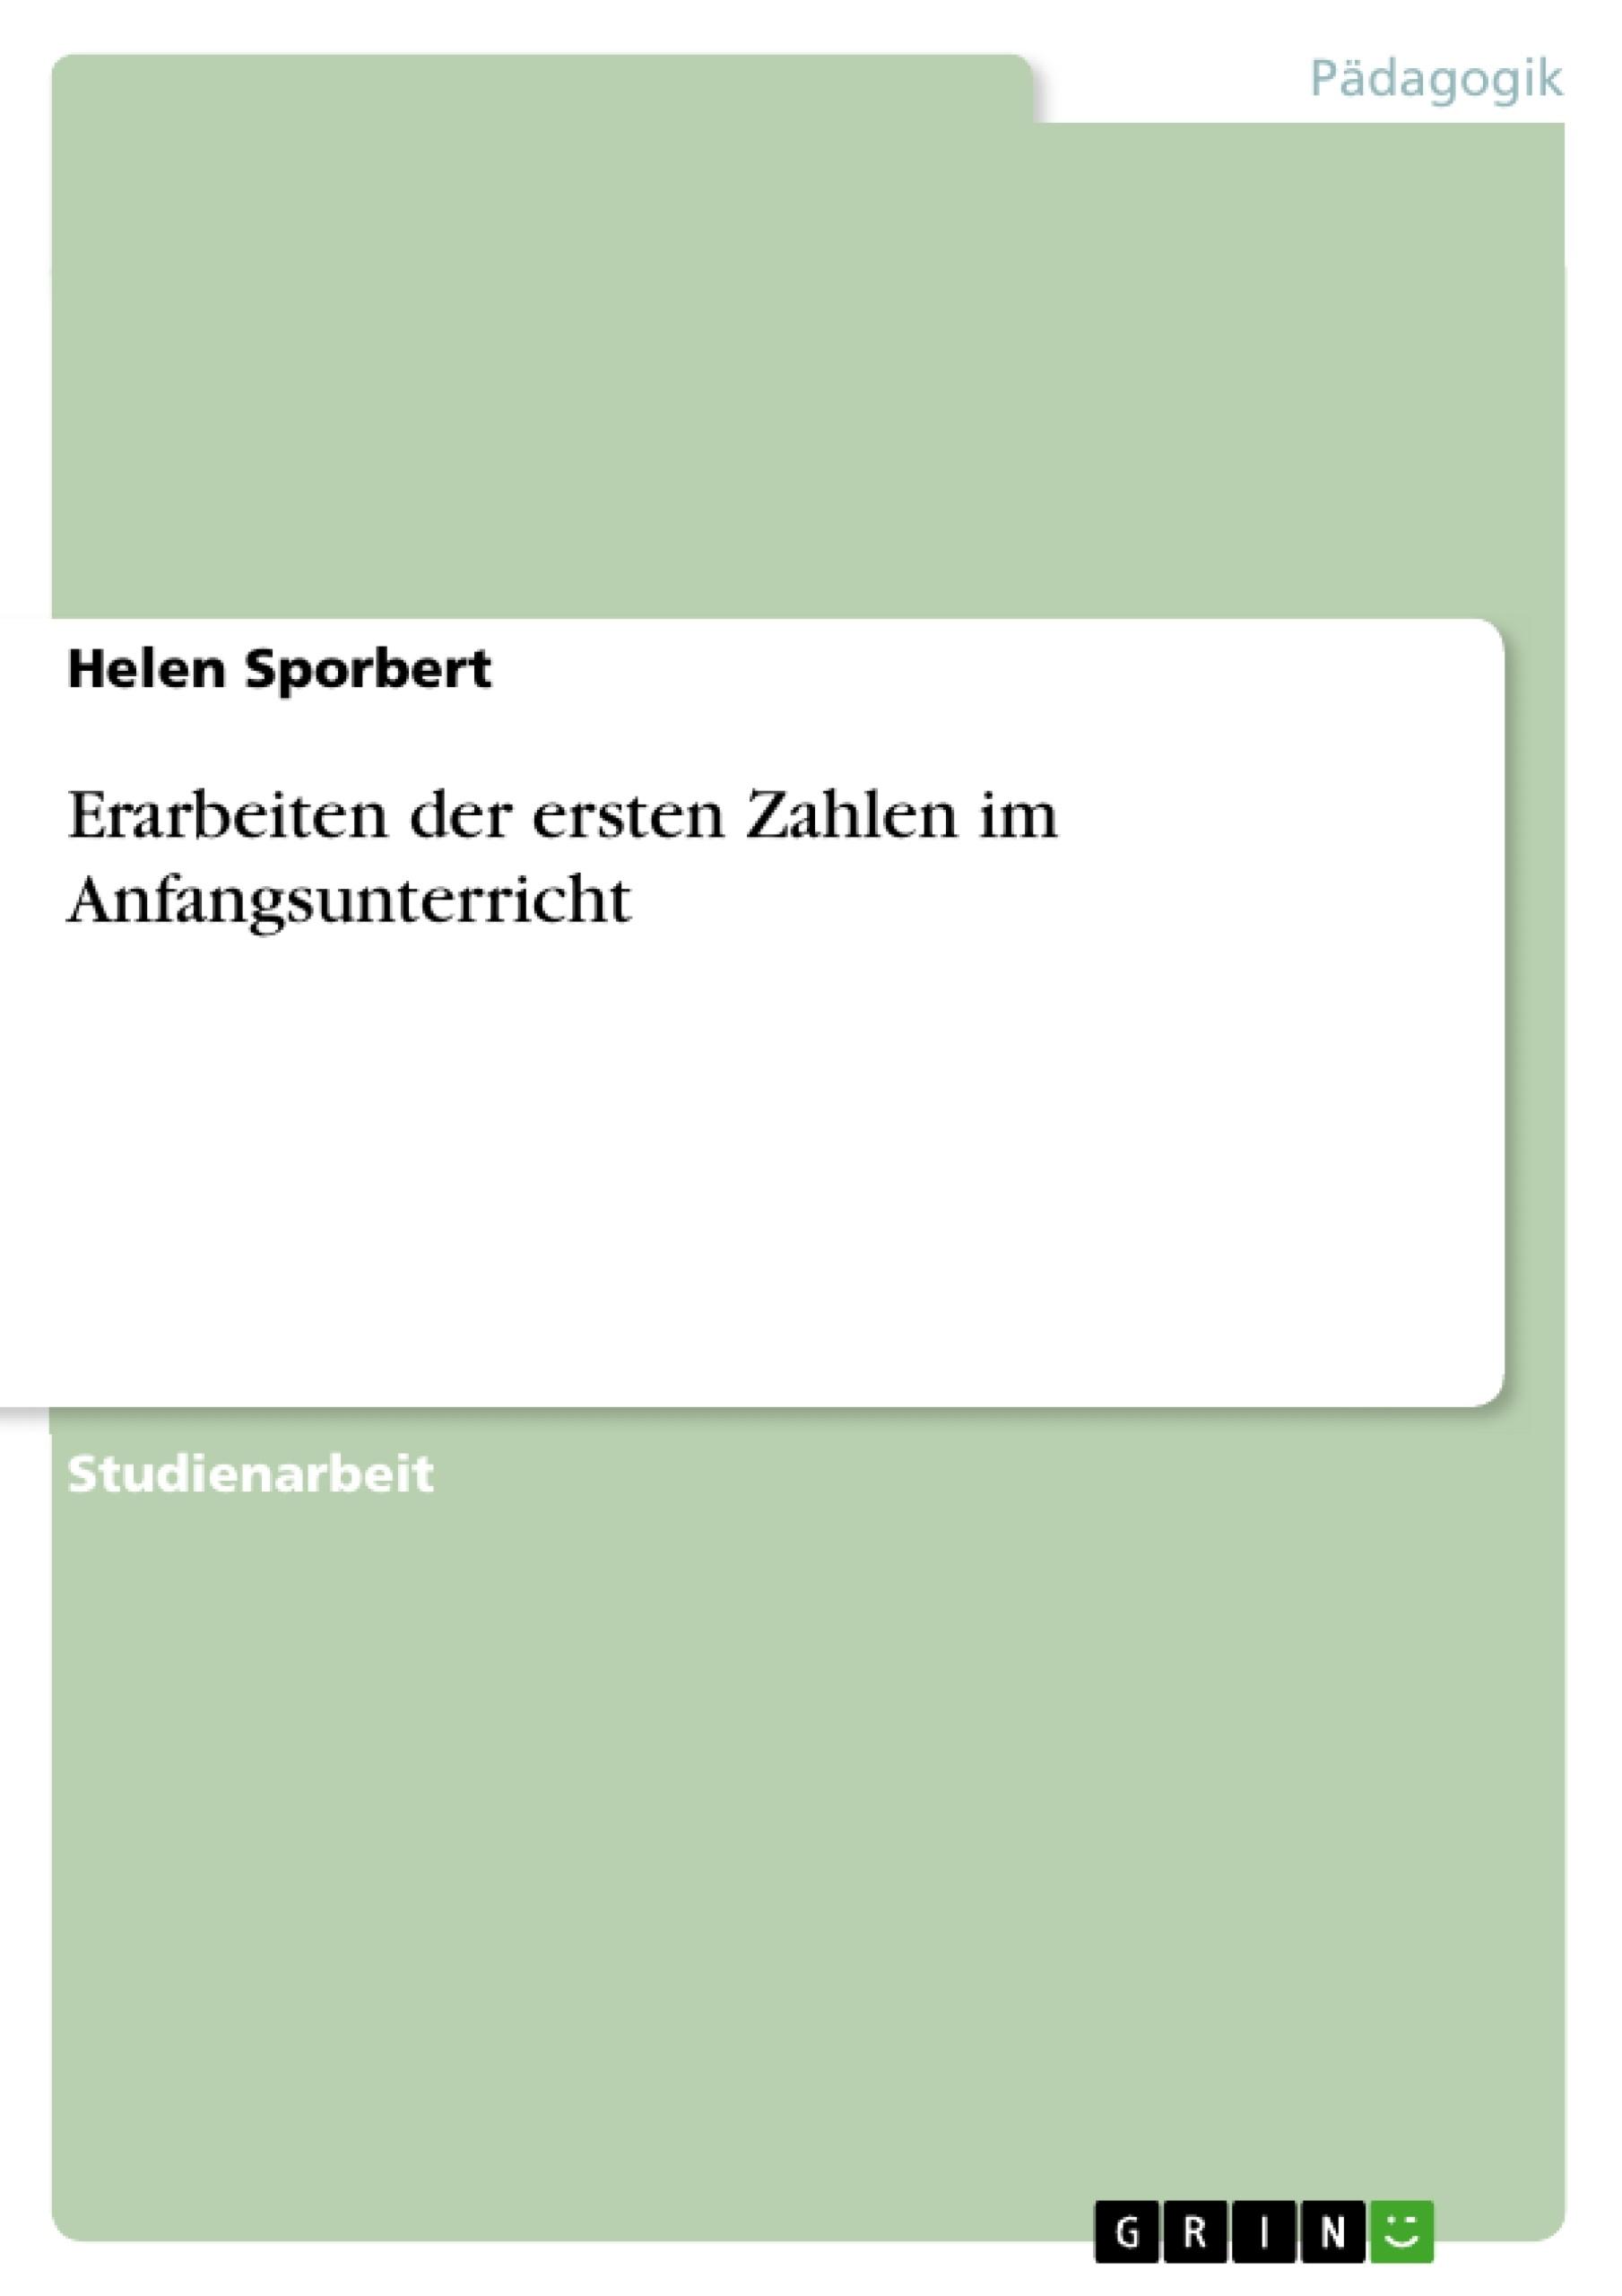 Colorful Math Tatsache Arbeitsblatt Motif - Kindergarten ...